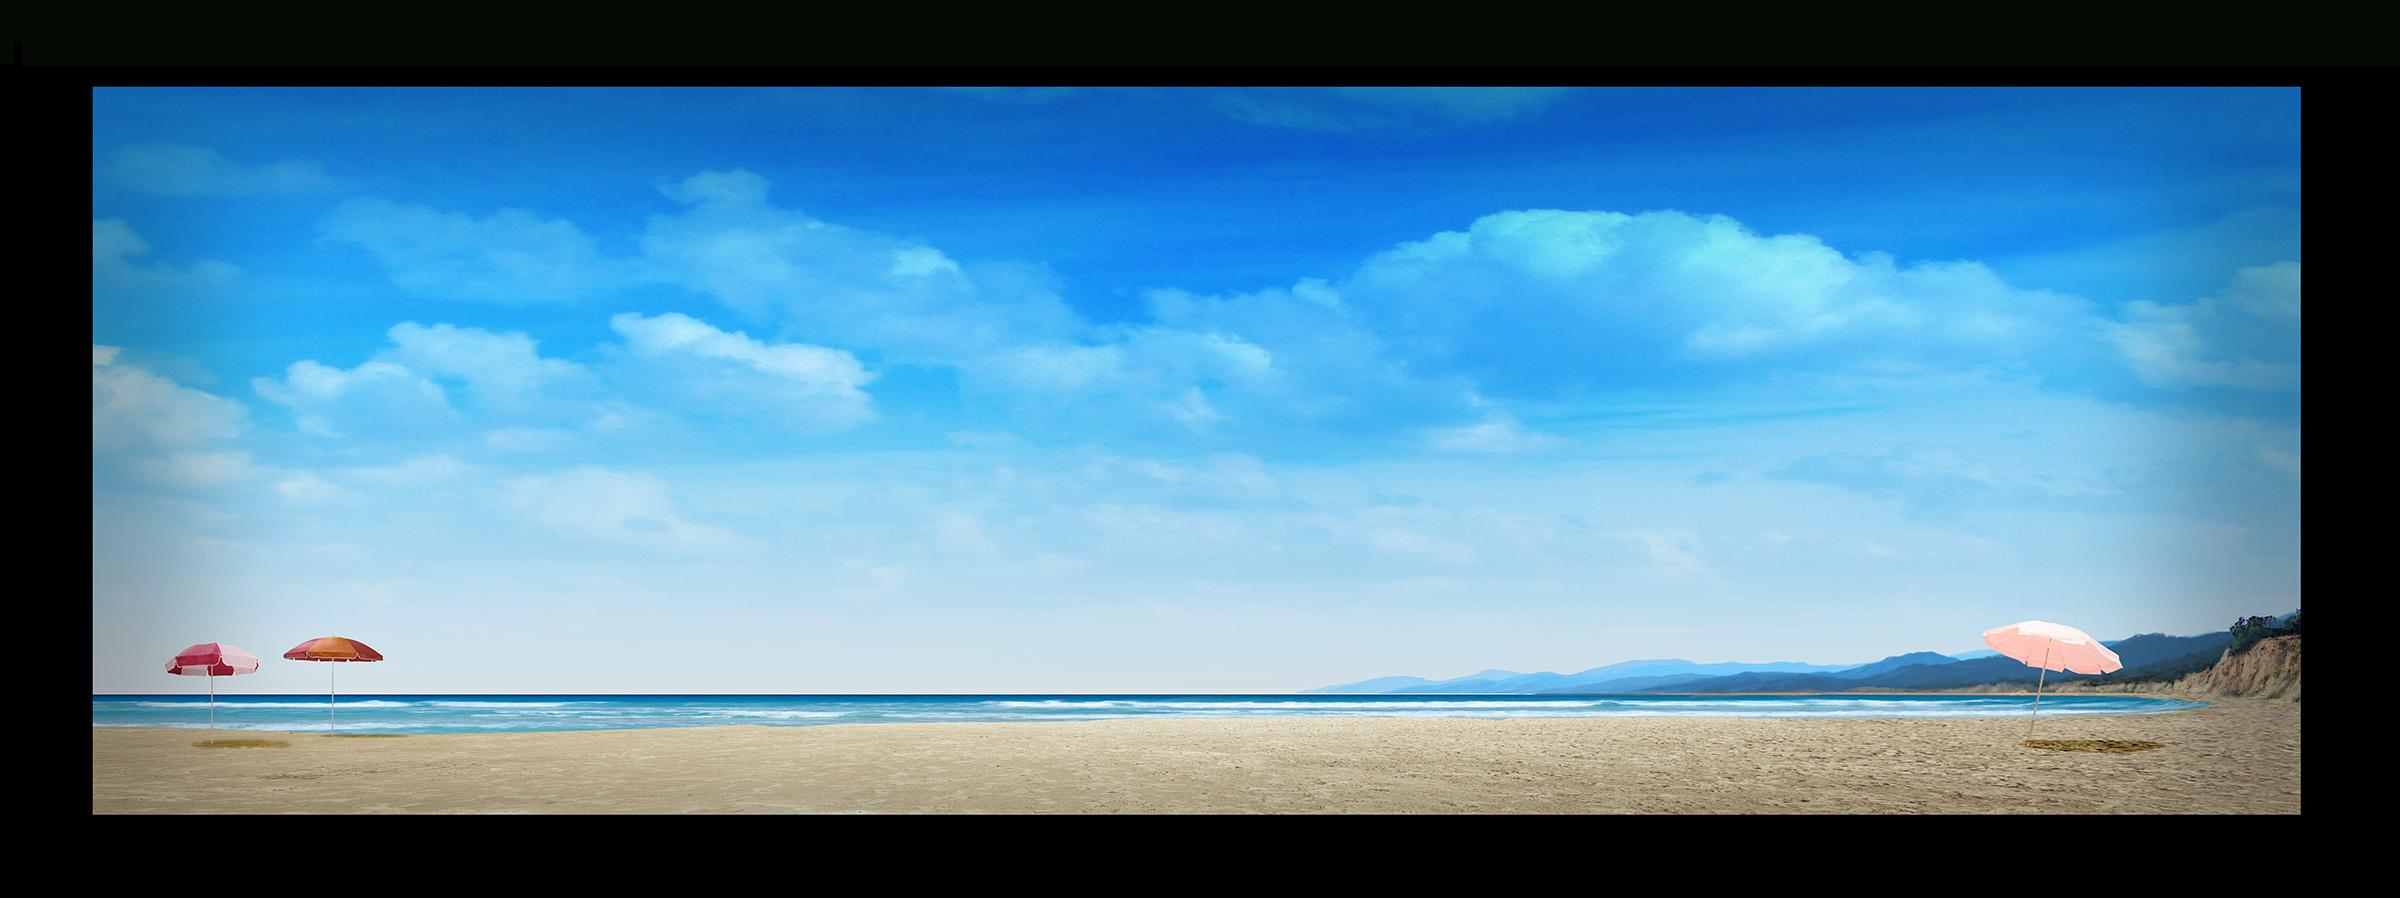 DIGITAL BACKGROUND : SURFIN' SAFARI